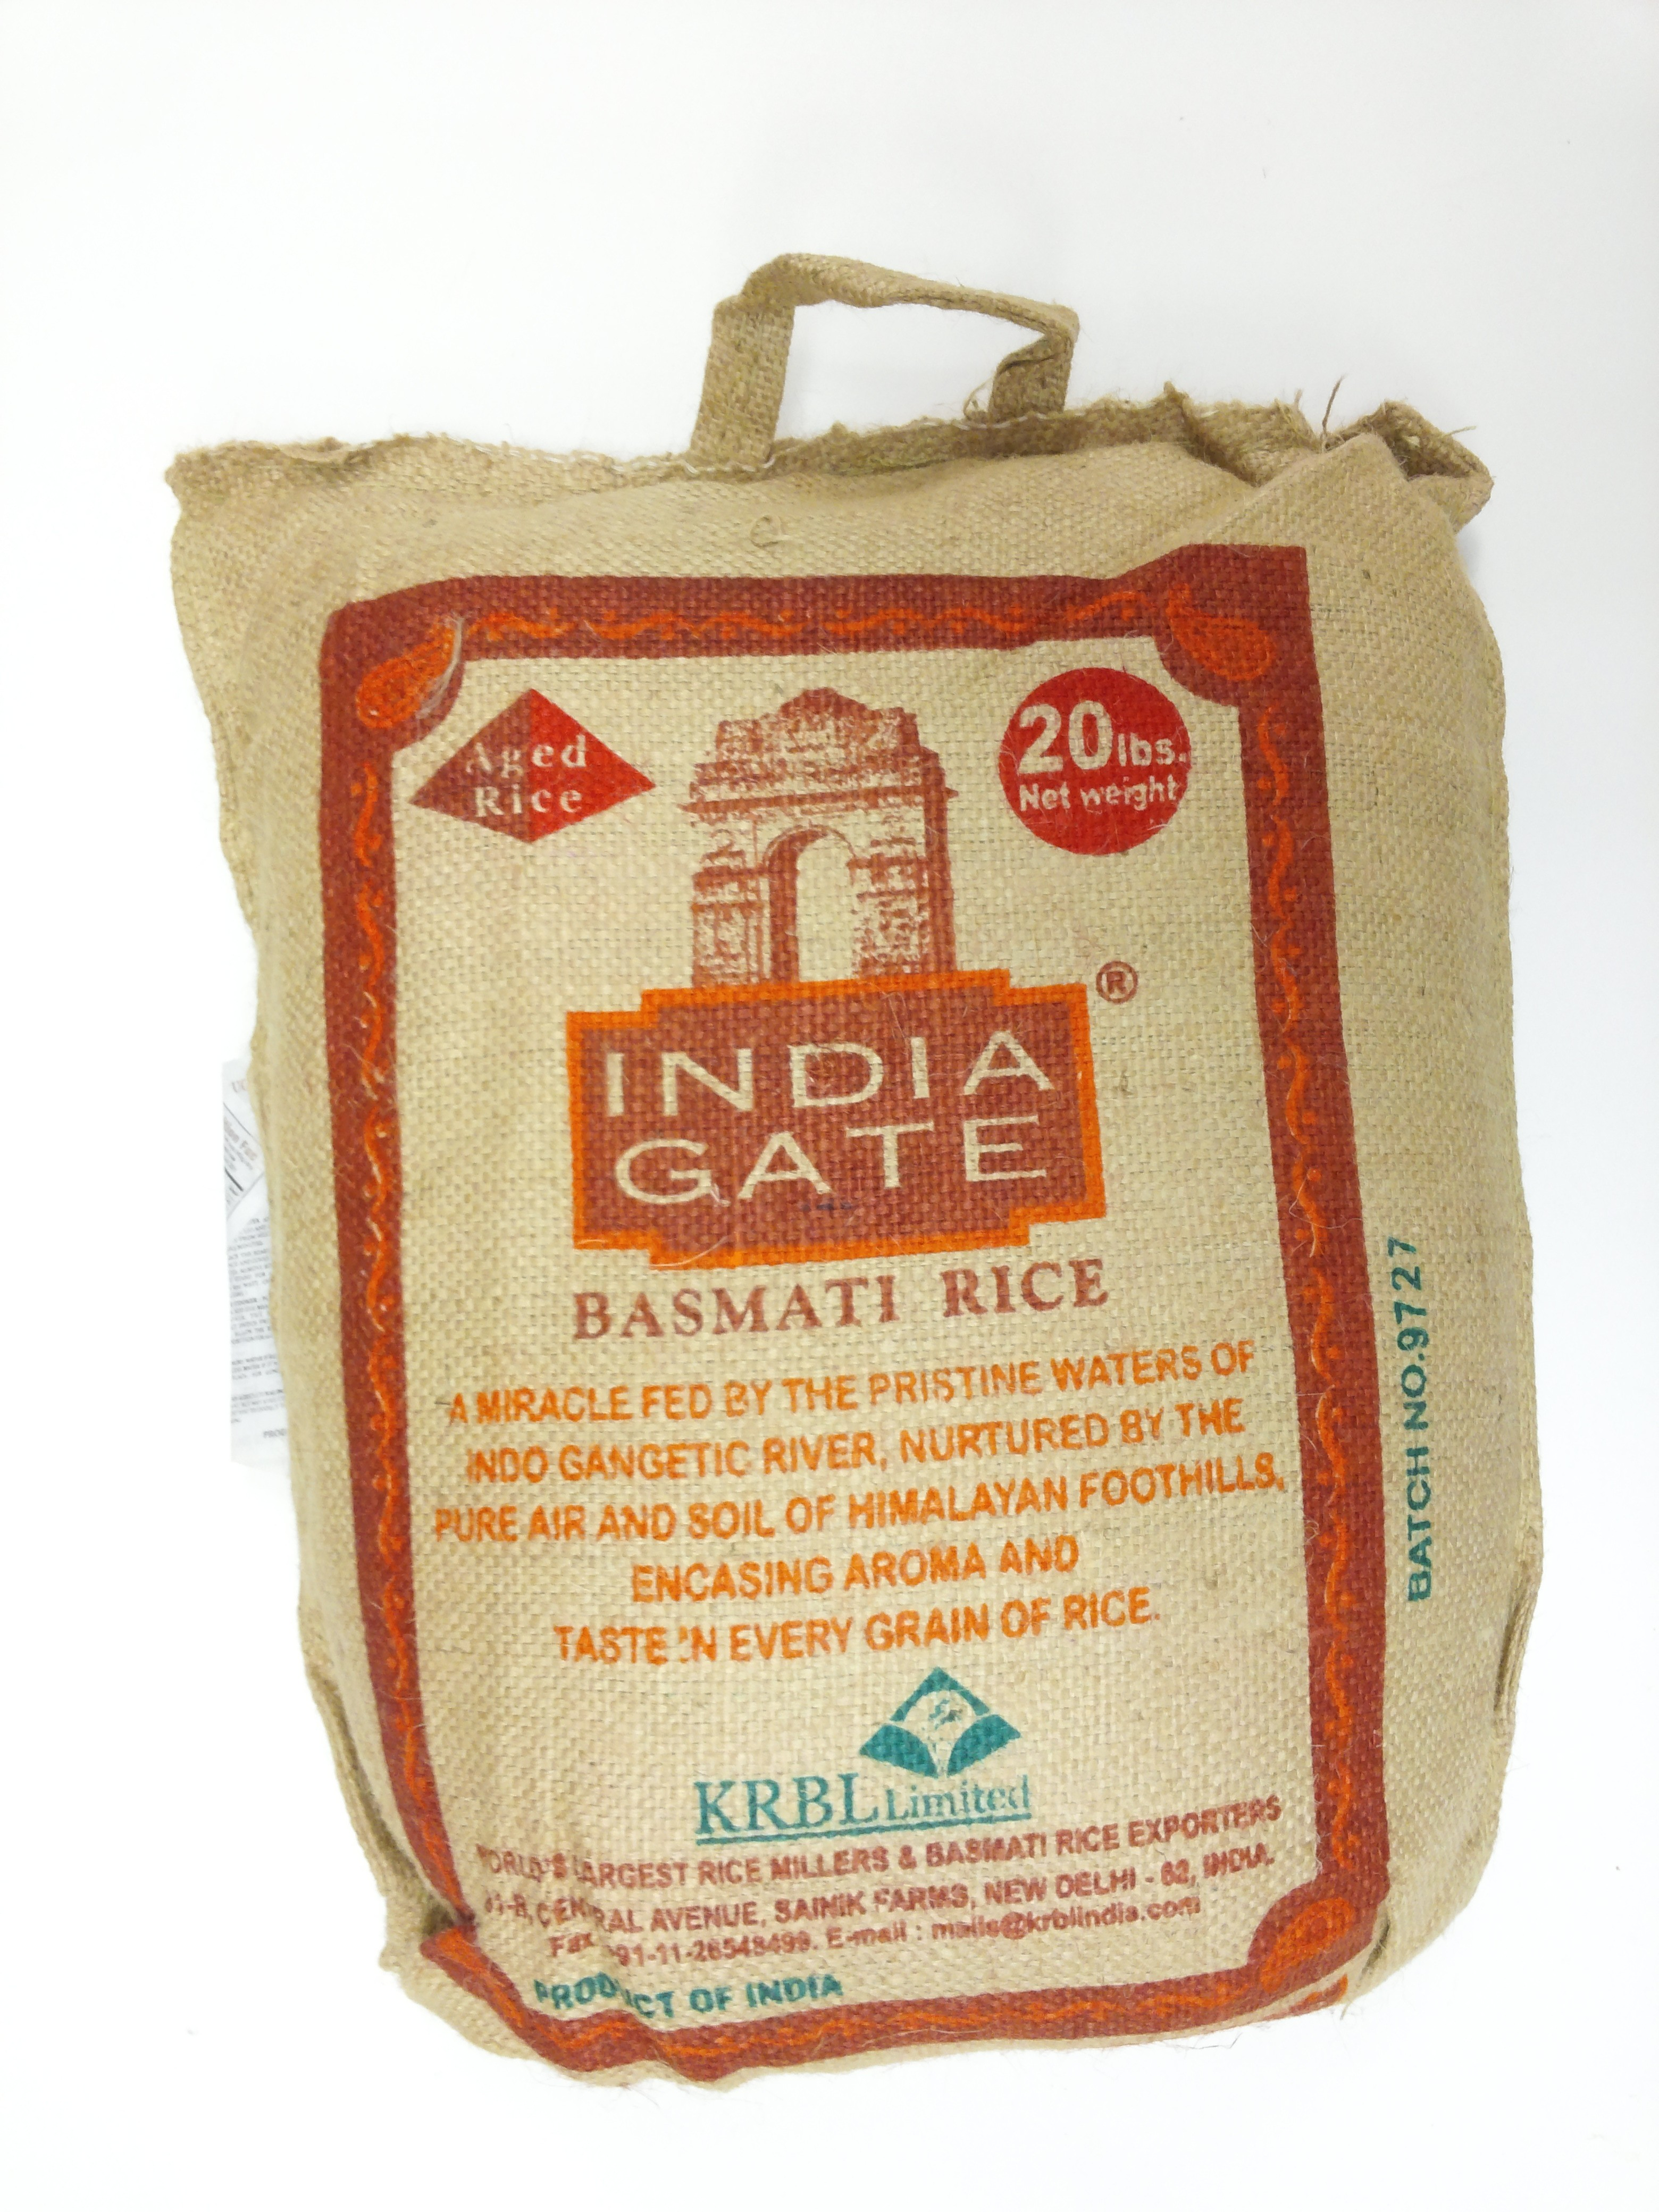 India gate basmati rice in india - Atb coin atb movie update